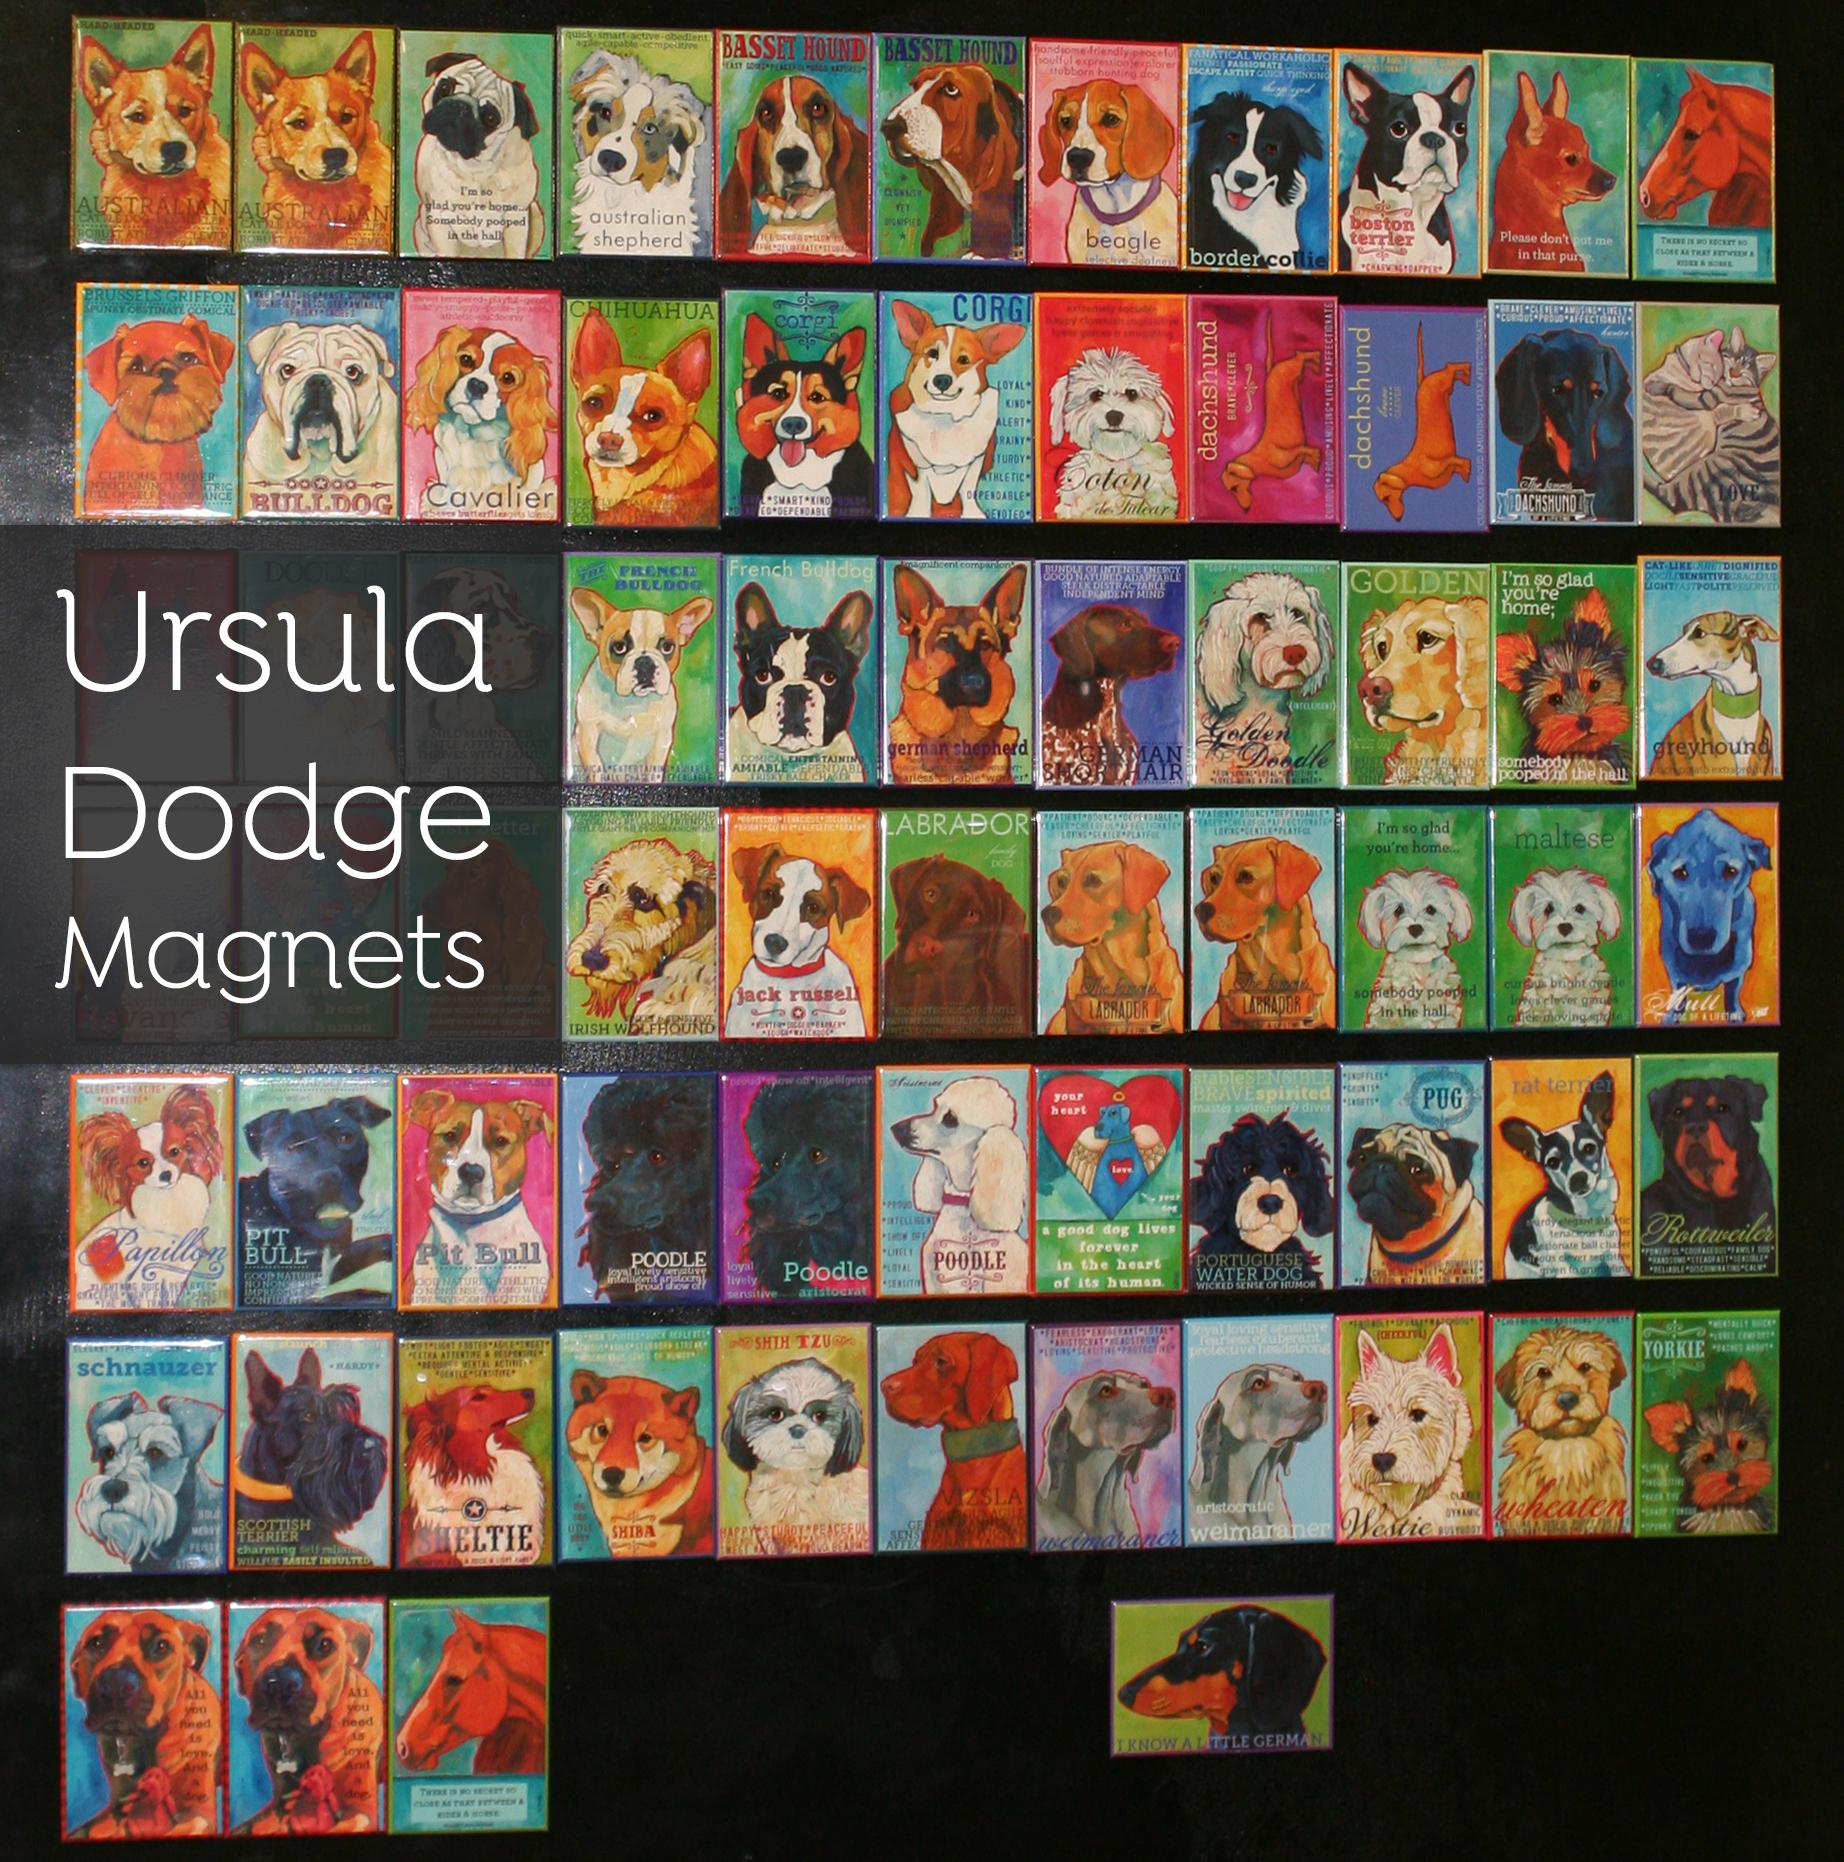 UrsulaDodgeMagnets.jpg